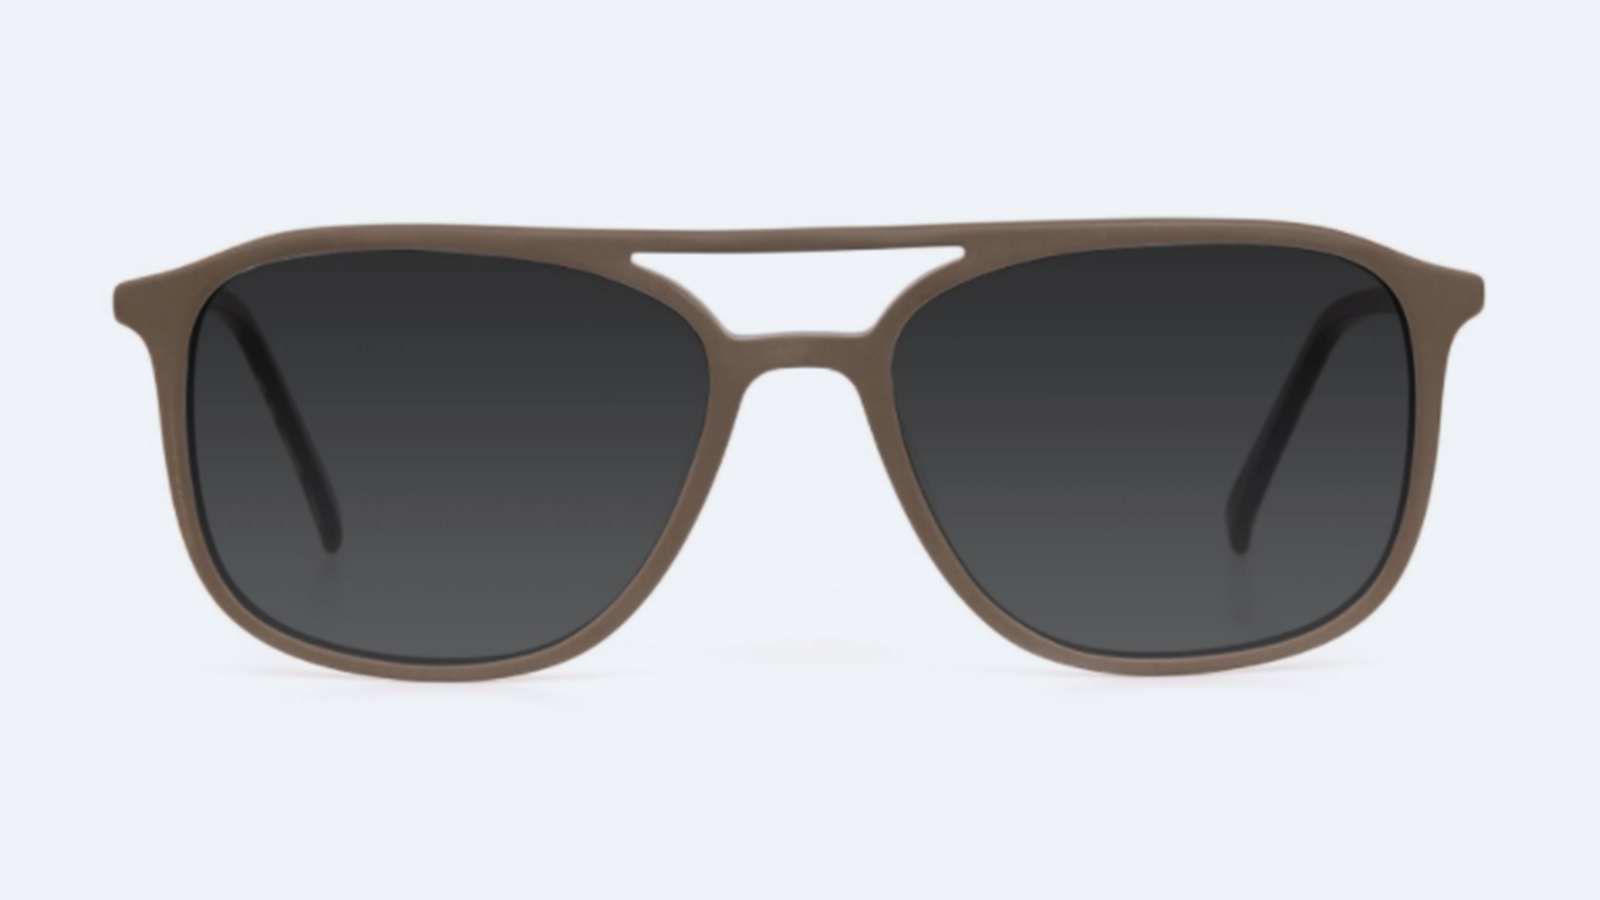 Double-bridge Rectangular Sunglasses